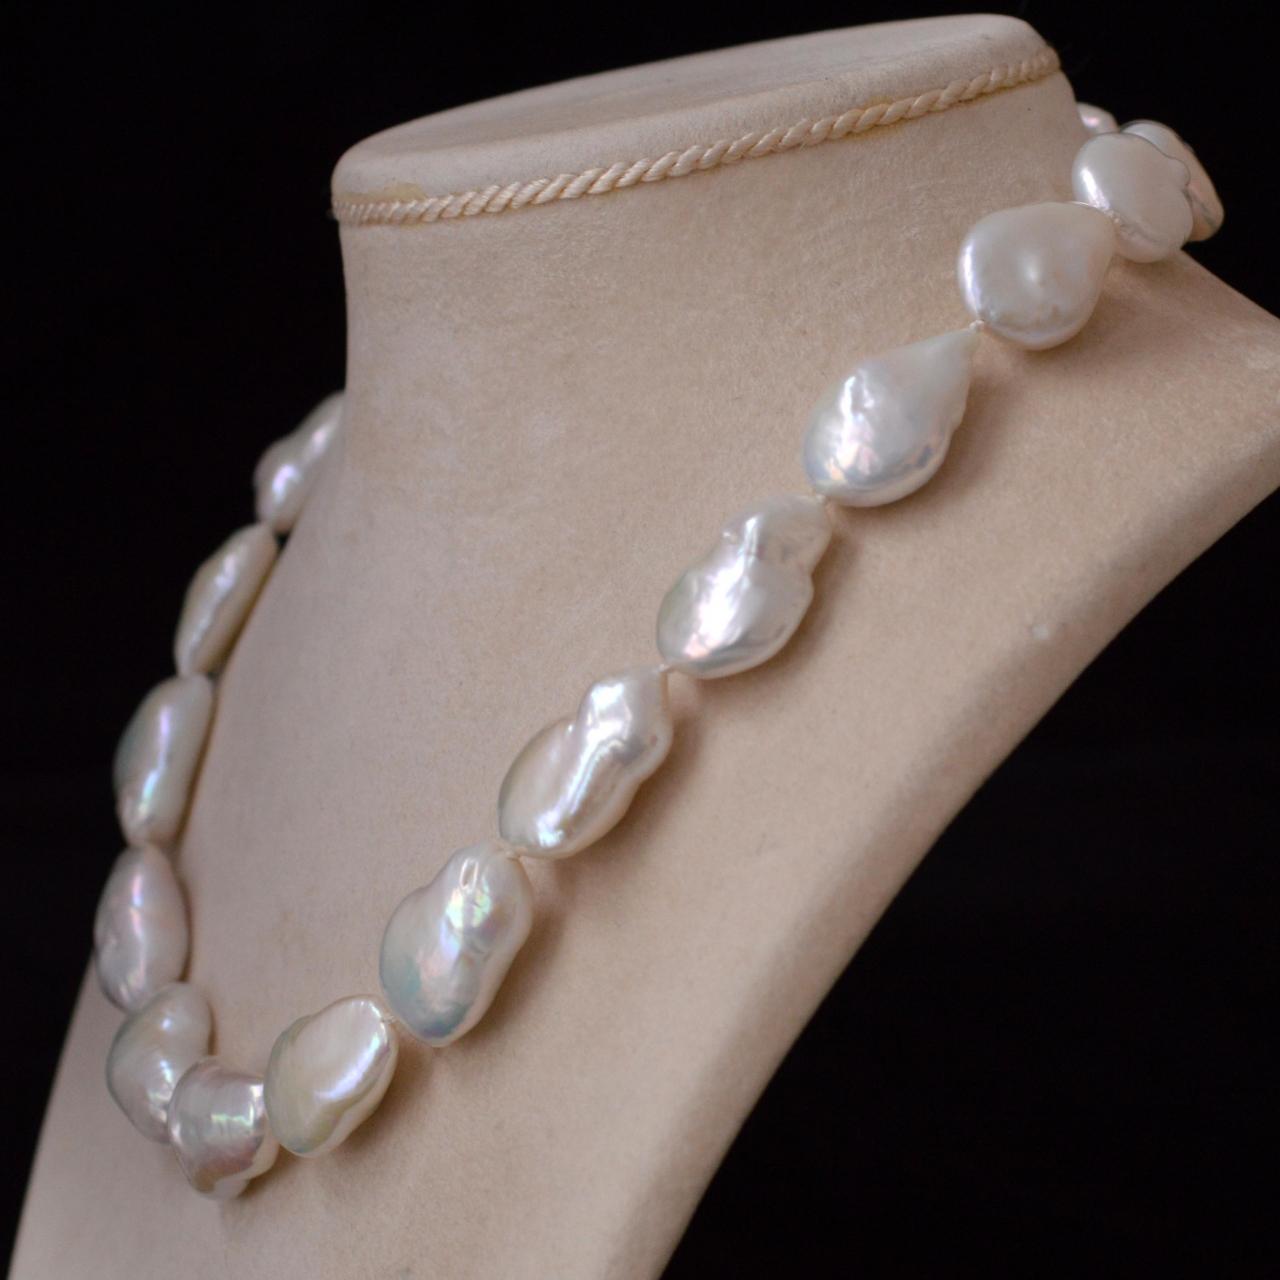 Keshi Pearl Necklace: White Keshi Pearl Necklace Rocks And Clocks White Keshi